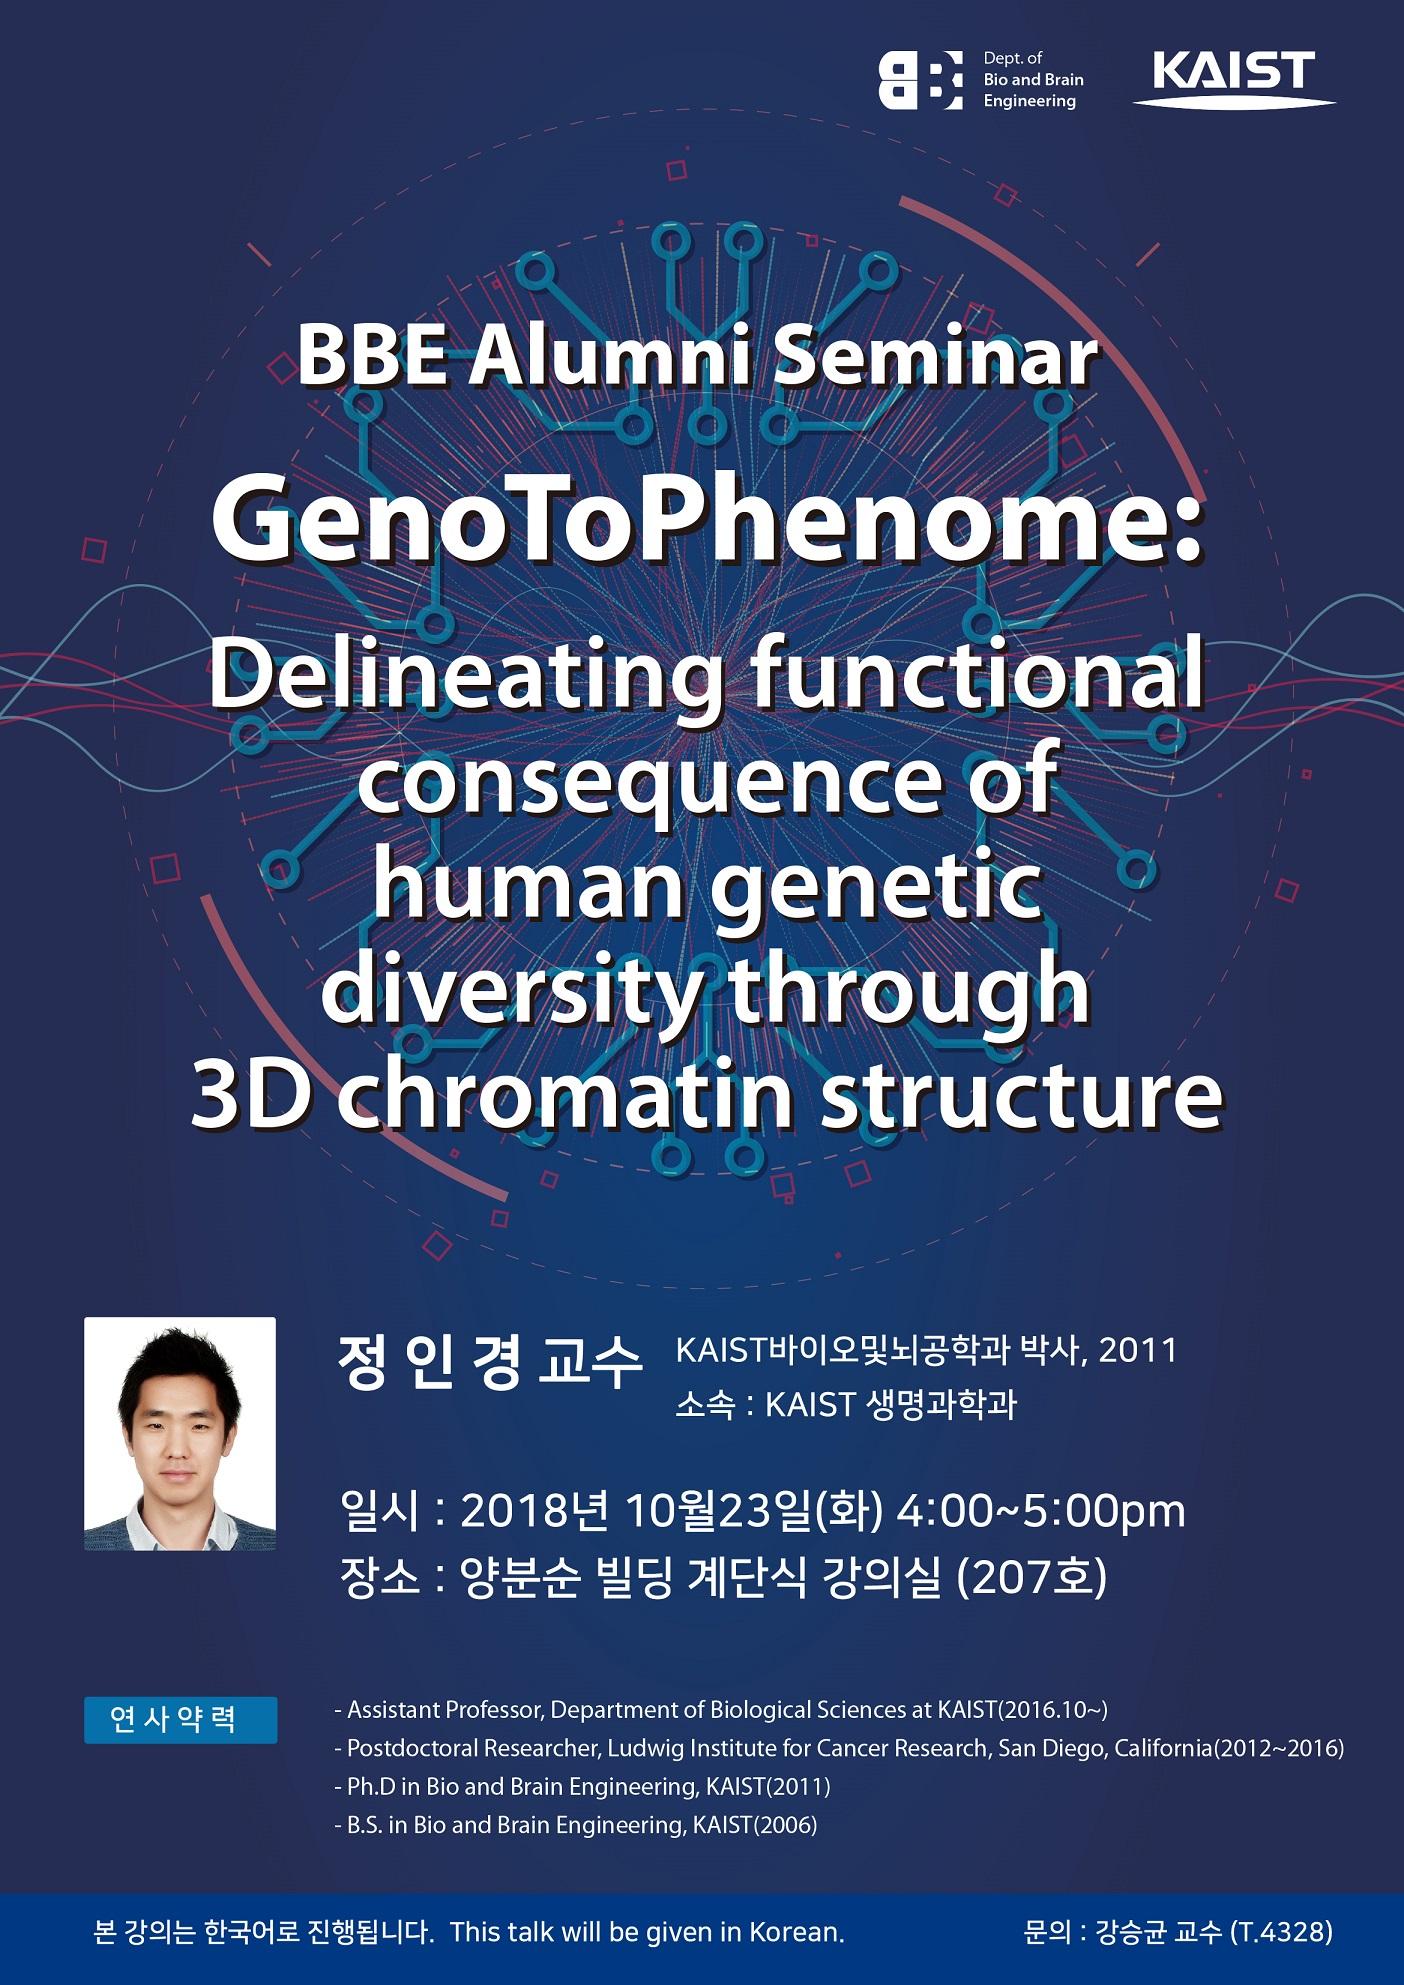 BBE Alumni Seminar 10.23 정인경 교수(생명과학과, KAIST)_EMAIL.jpg